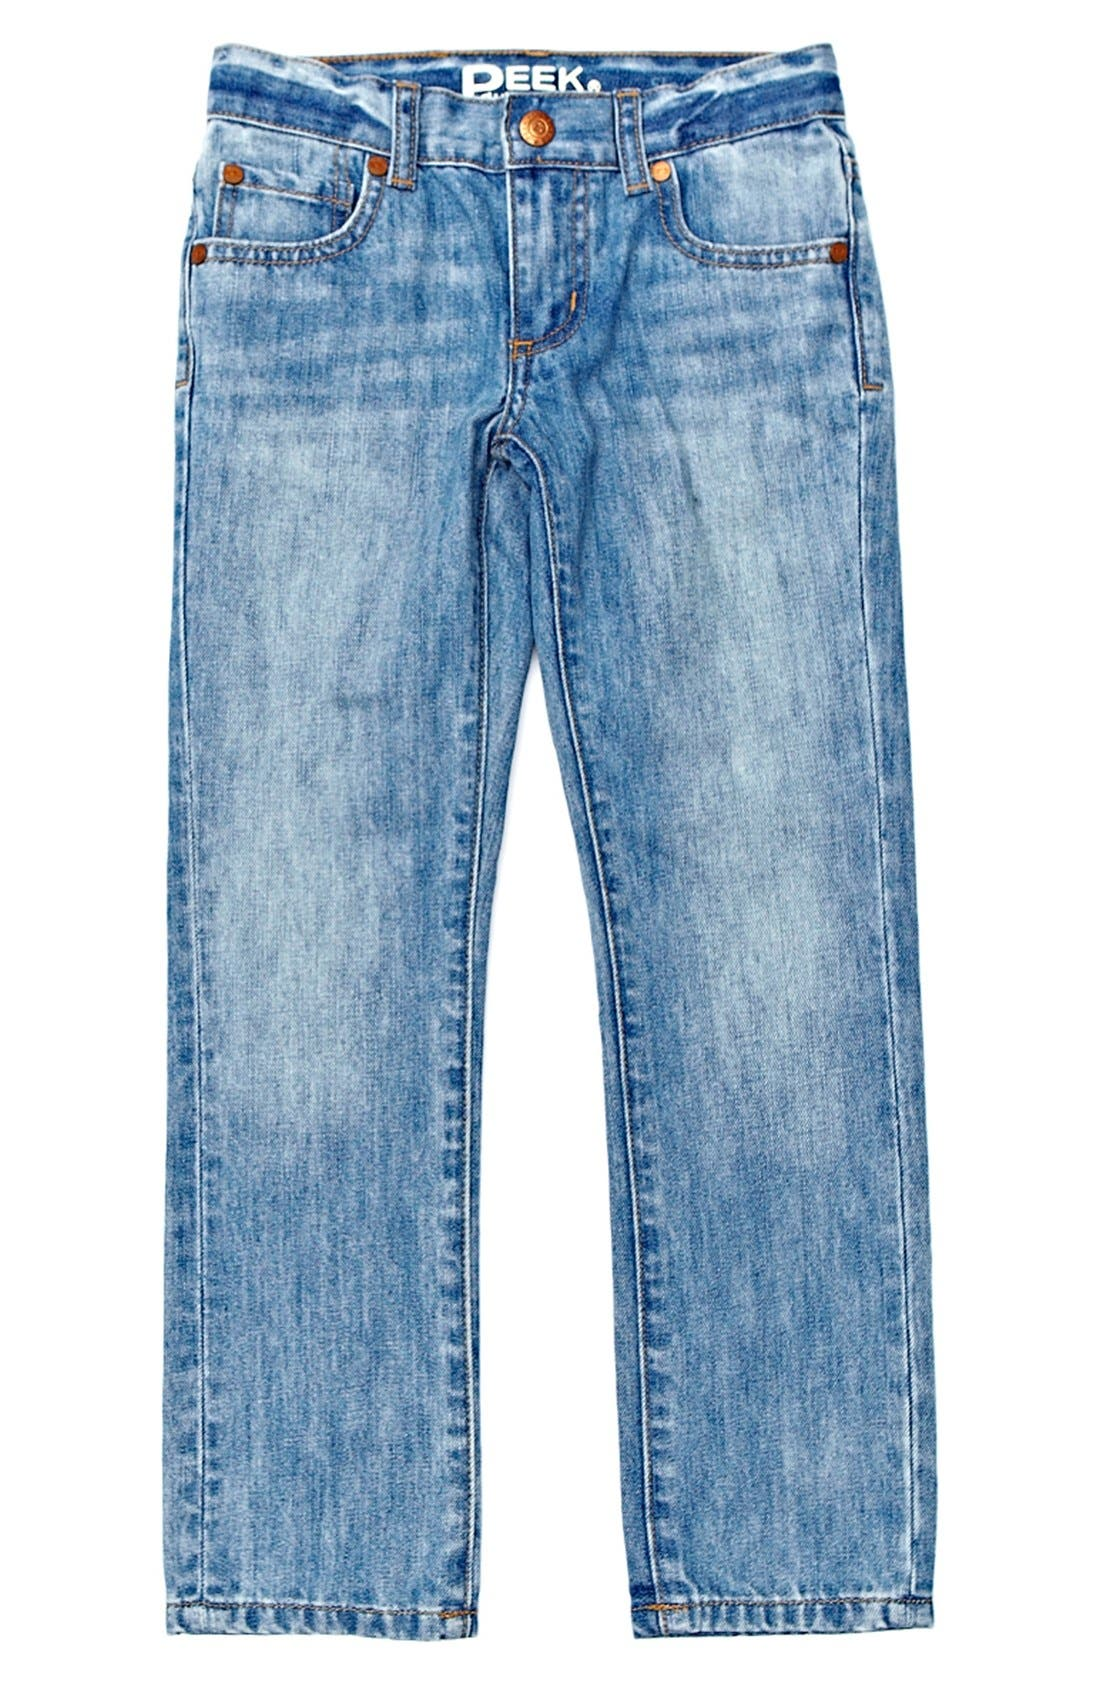 Alternate Image 2  - Peek 'Slouch' Jeans (Big Boys)